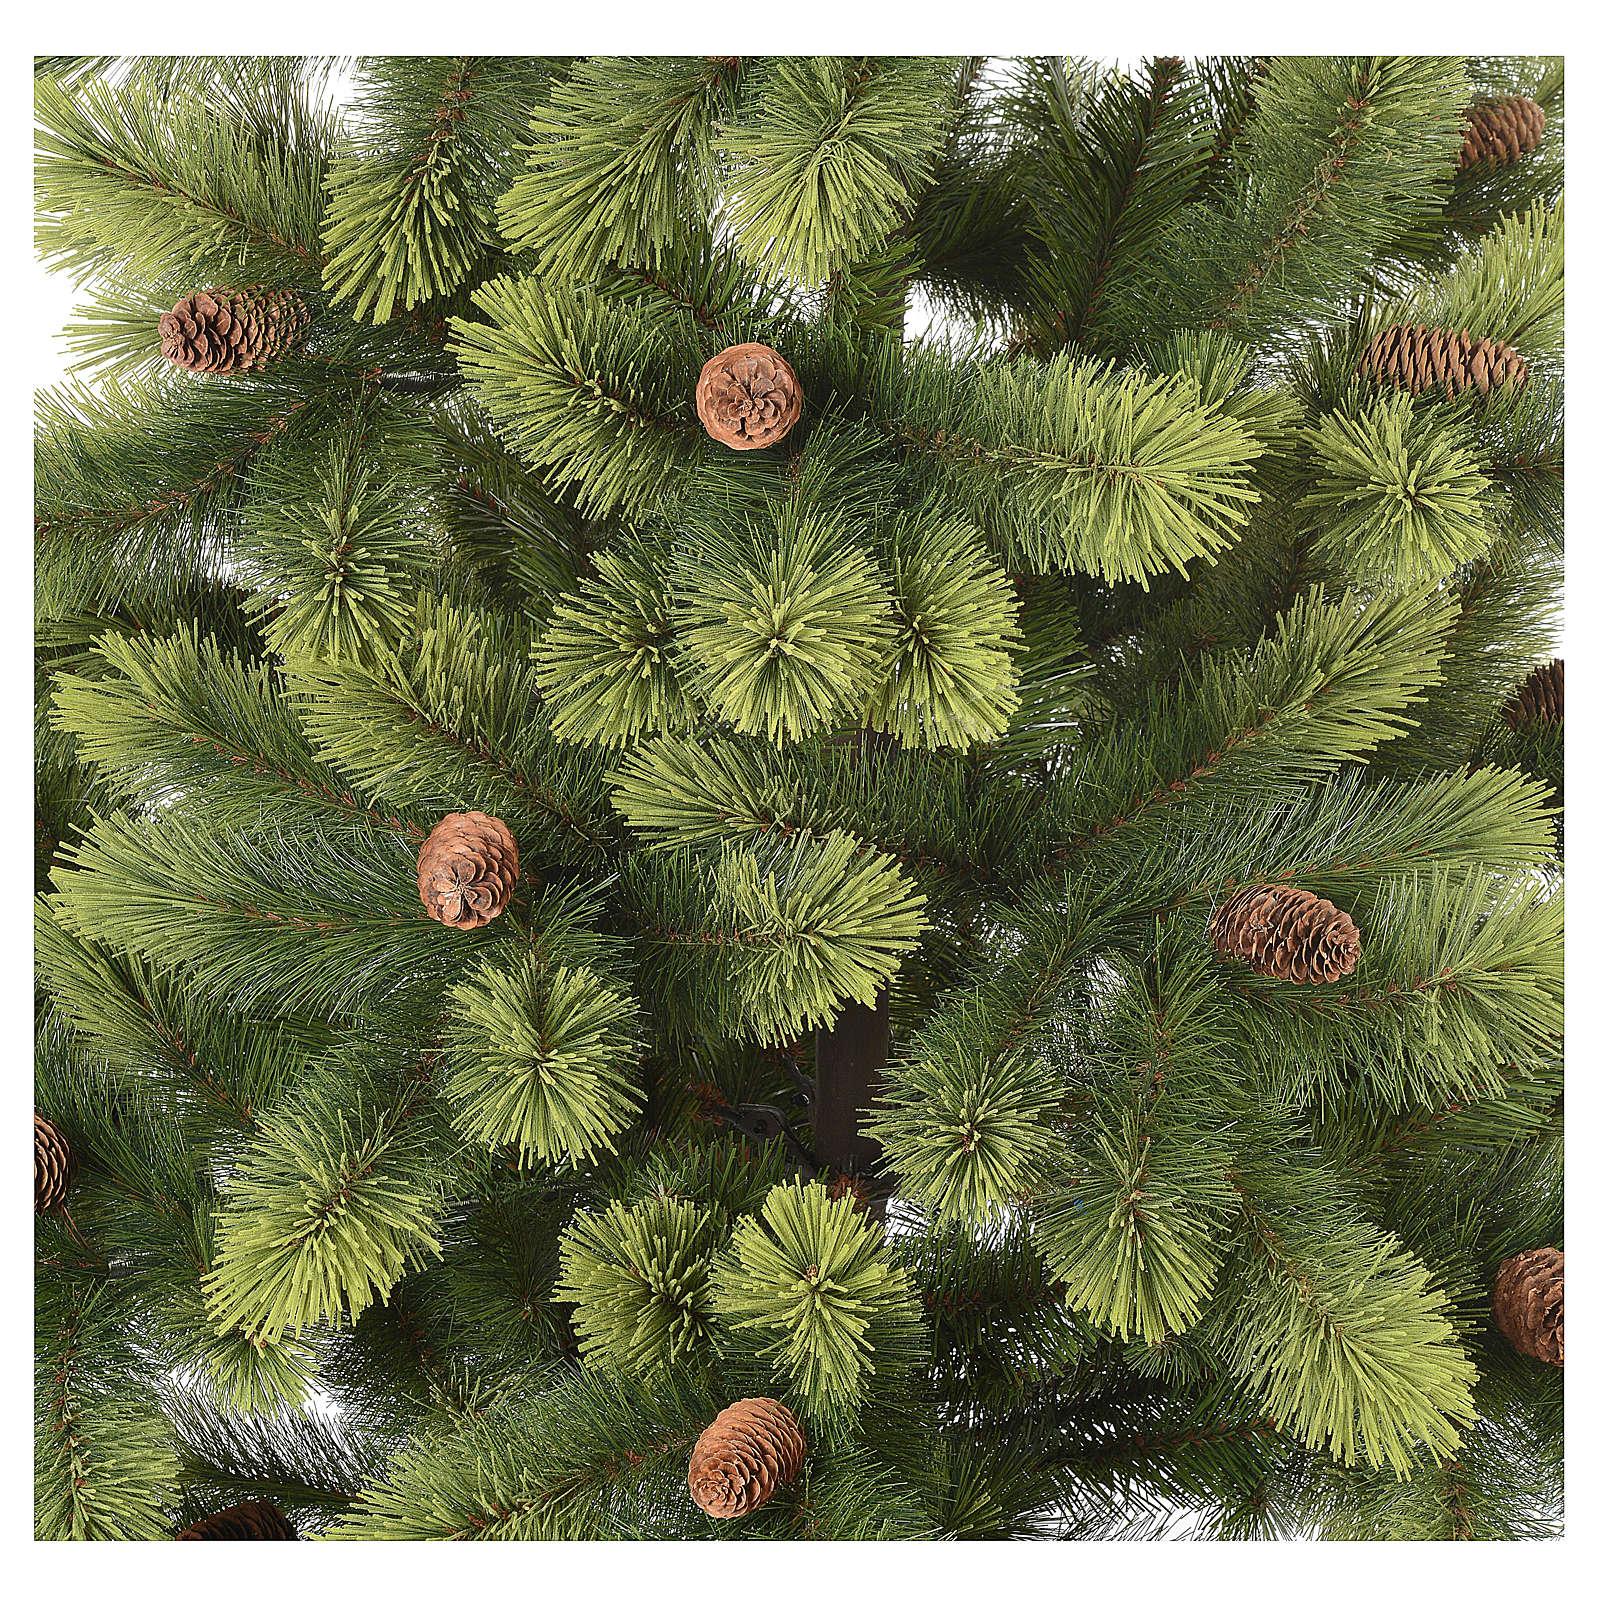 Albero Di Natale 210.Albero Di Natale 210 Cm Verde Pigne Woodland Carolina Vendita Online Su Holyart